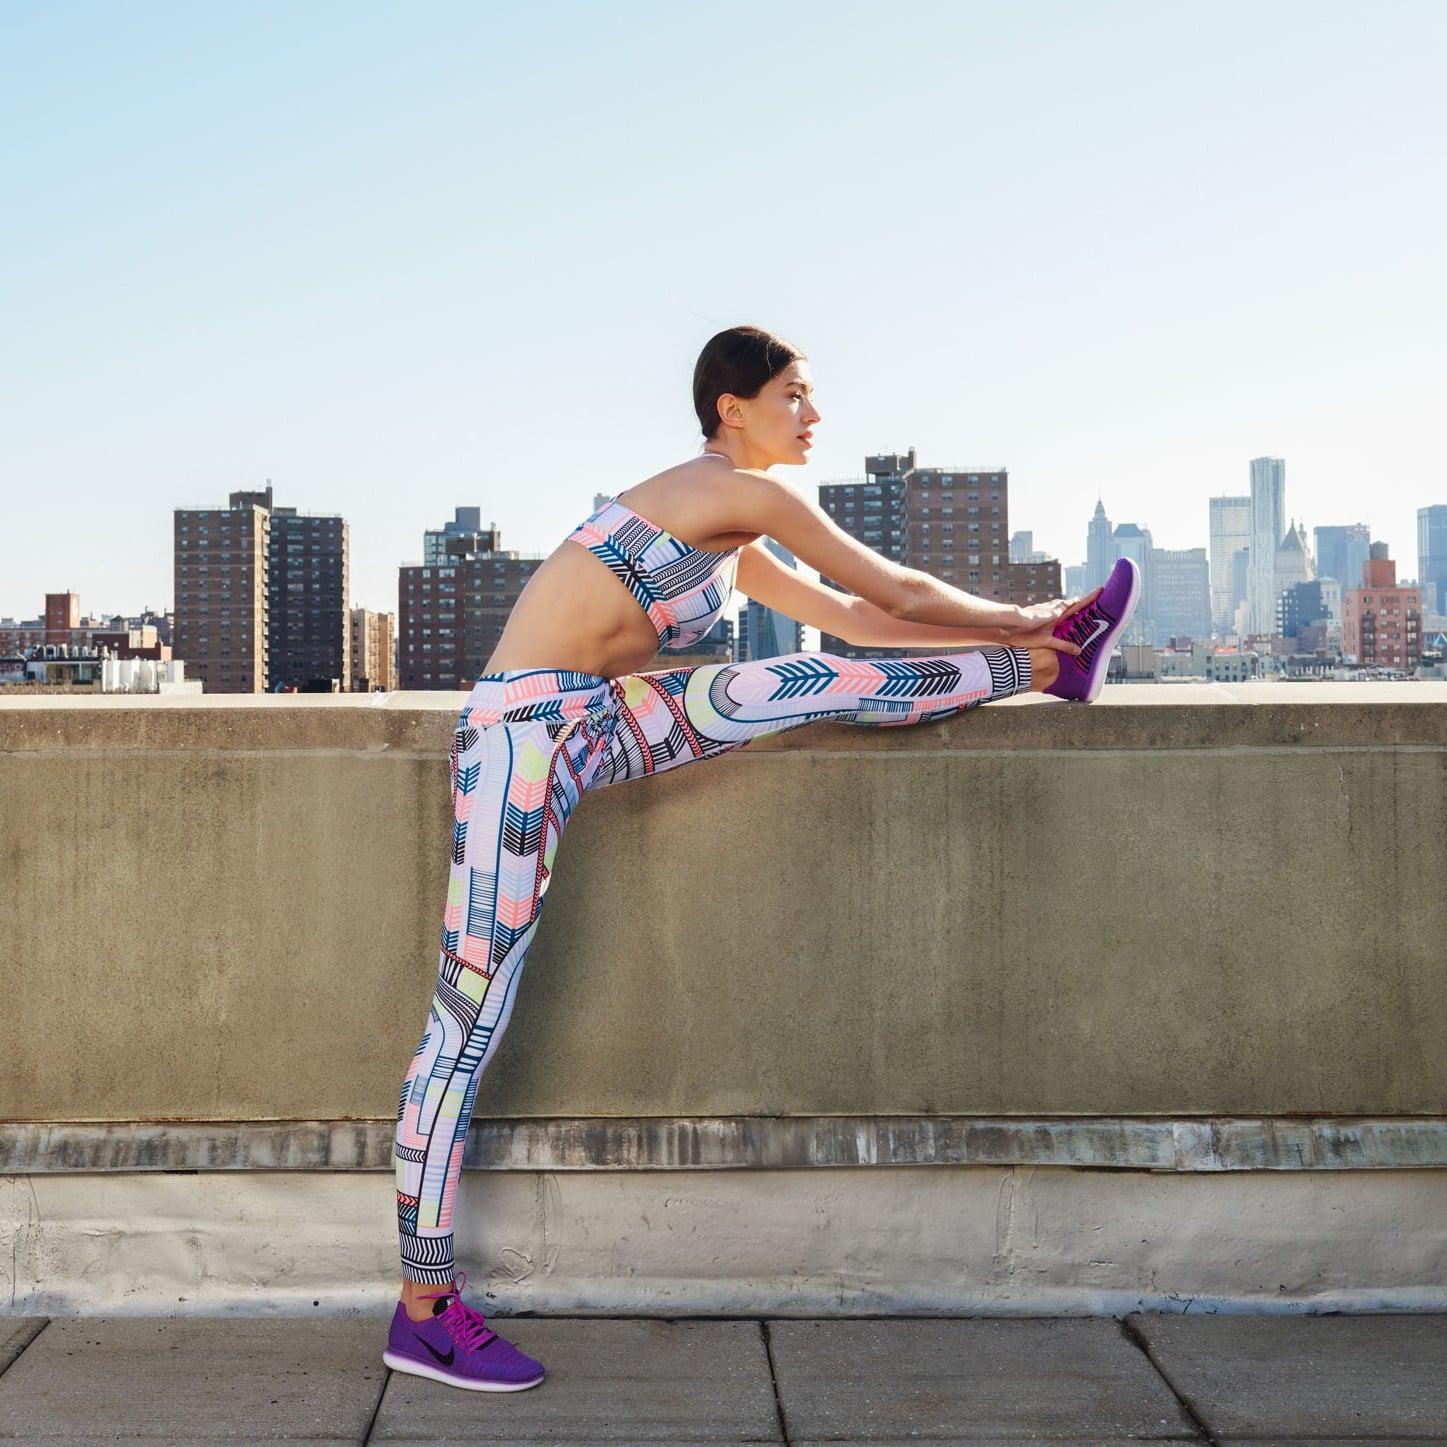 How Should I Start Running? | POPSUGAR Fitness Australia